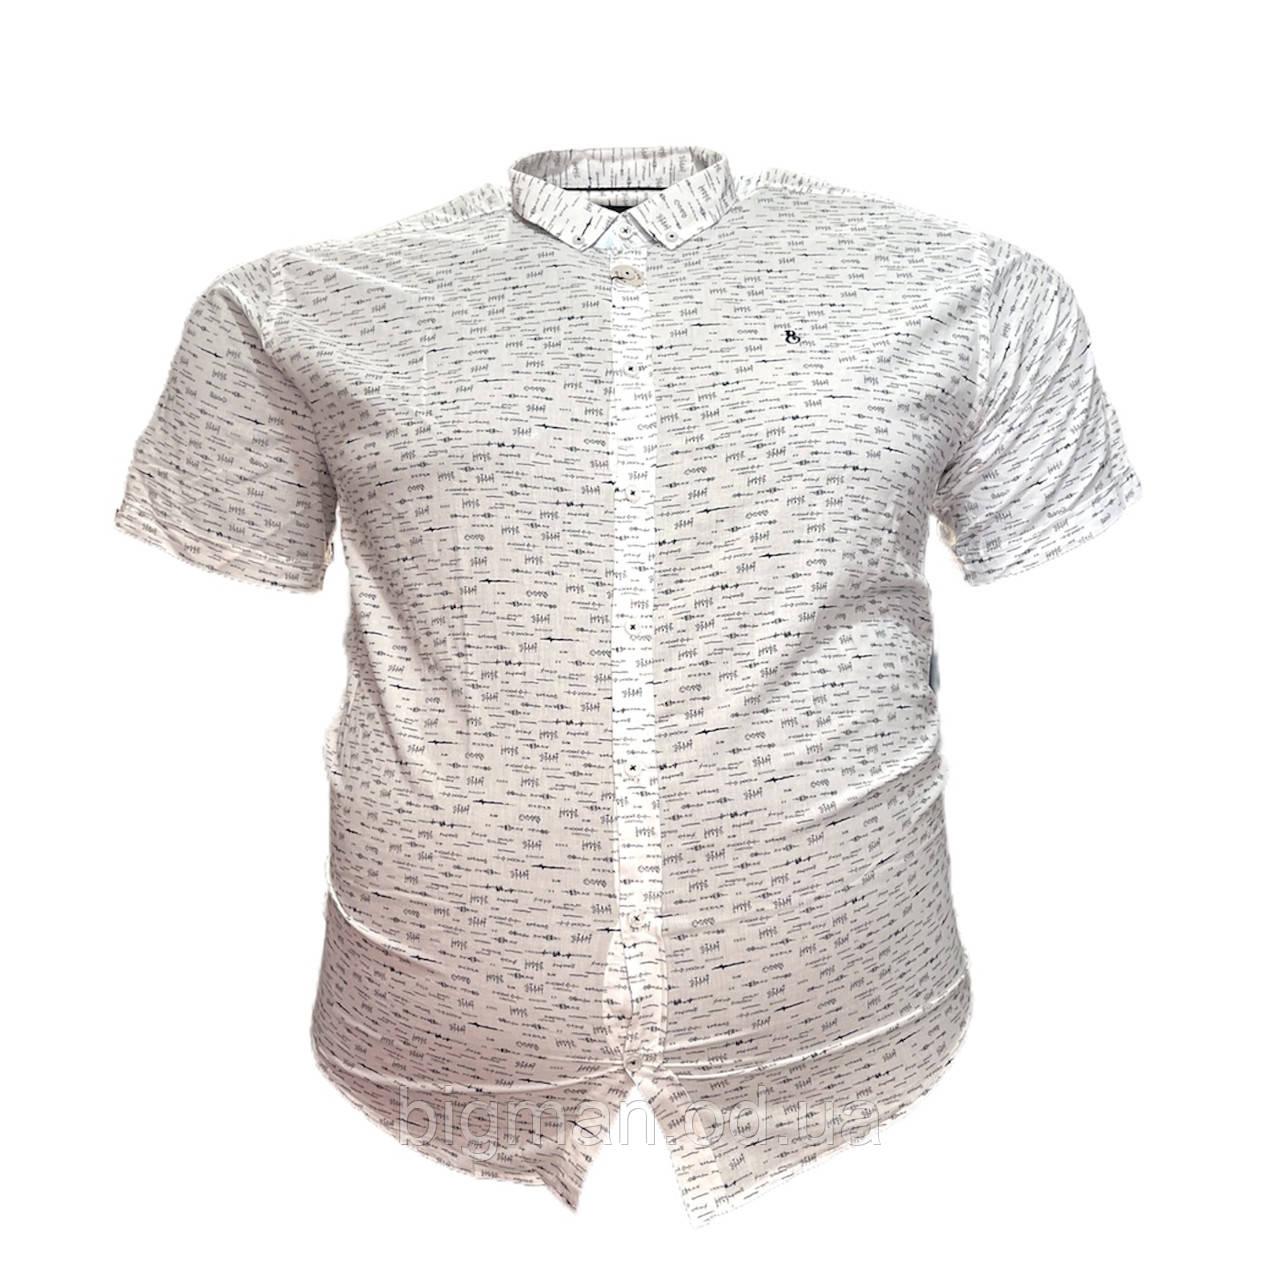 Мужская рубашка с коротким рукавом Barcotti 16082 2XL 3XL 4XL 5XL 6XL белая большие размеры батал Турция